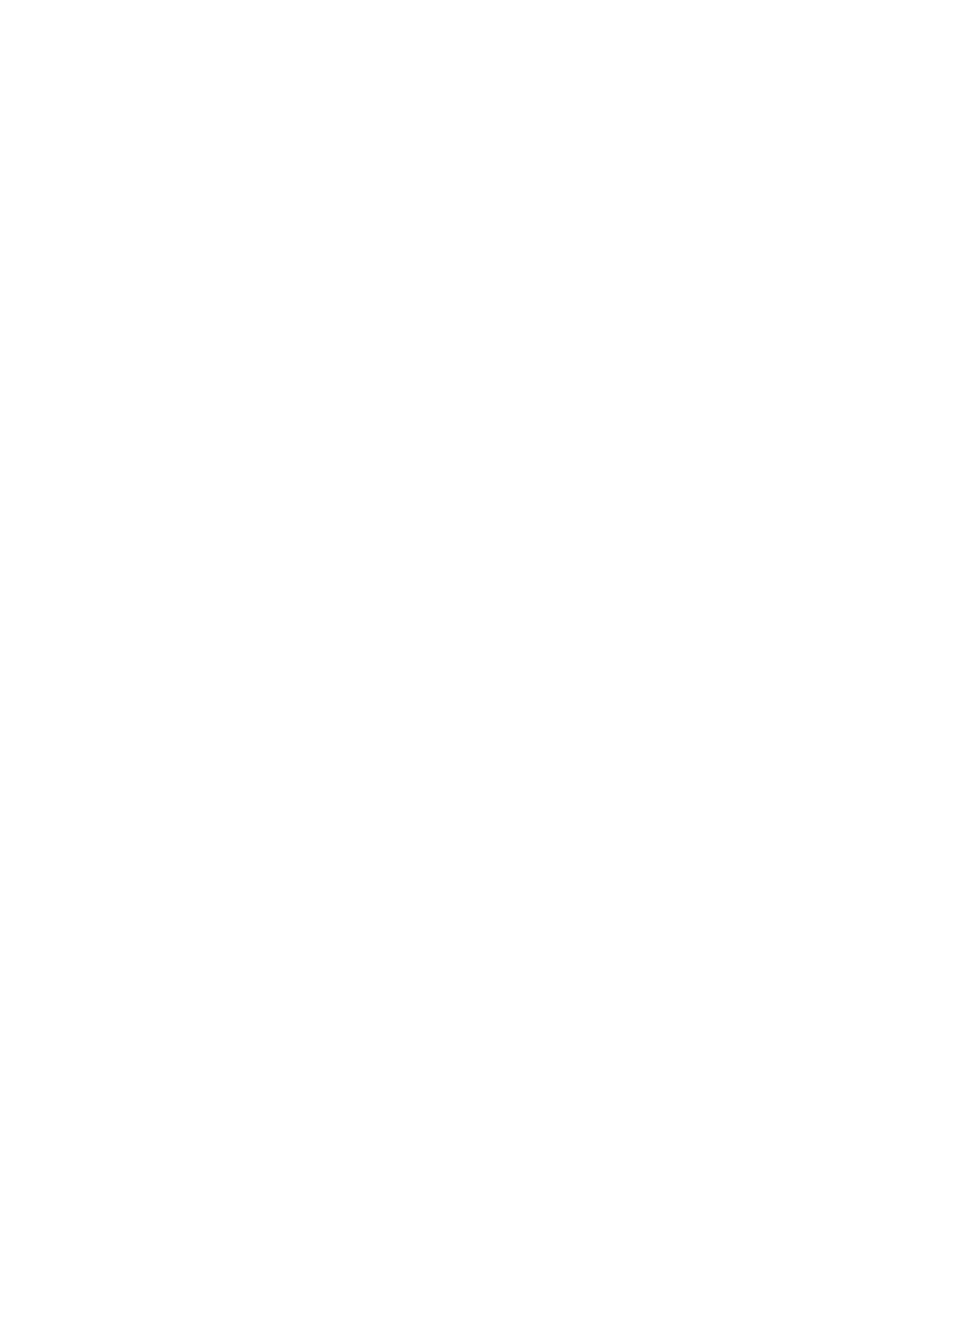 Edugorilla NVS PGT Chemistry 2020   10 Mock Test For Complete Preparation - Page 5